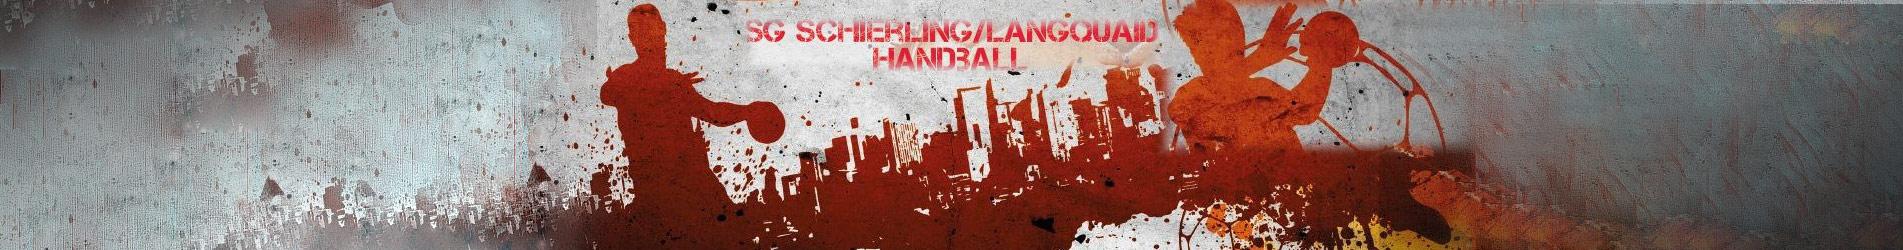 Handball Schierling